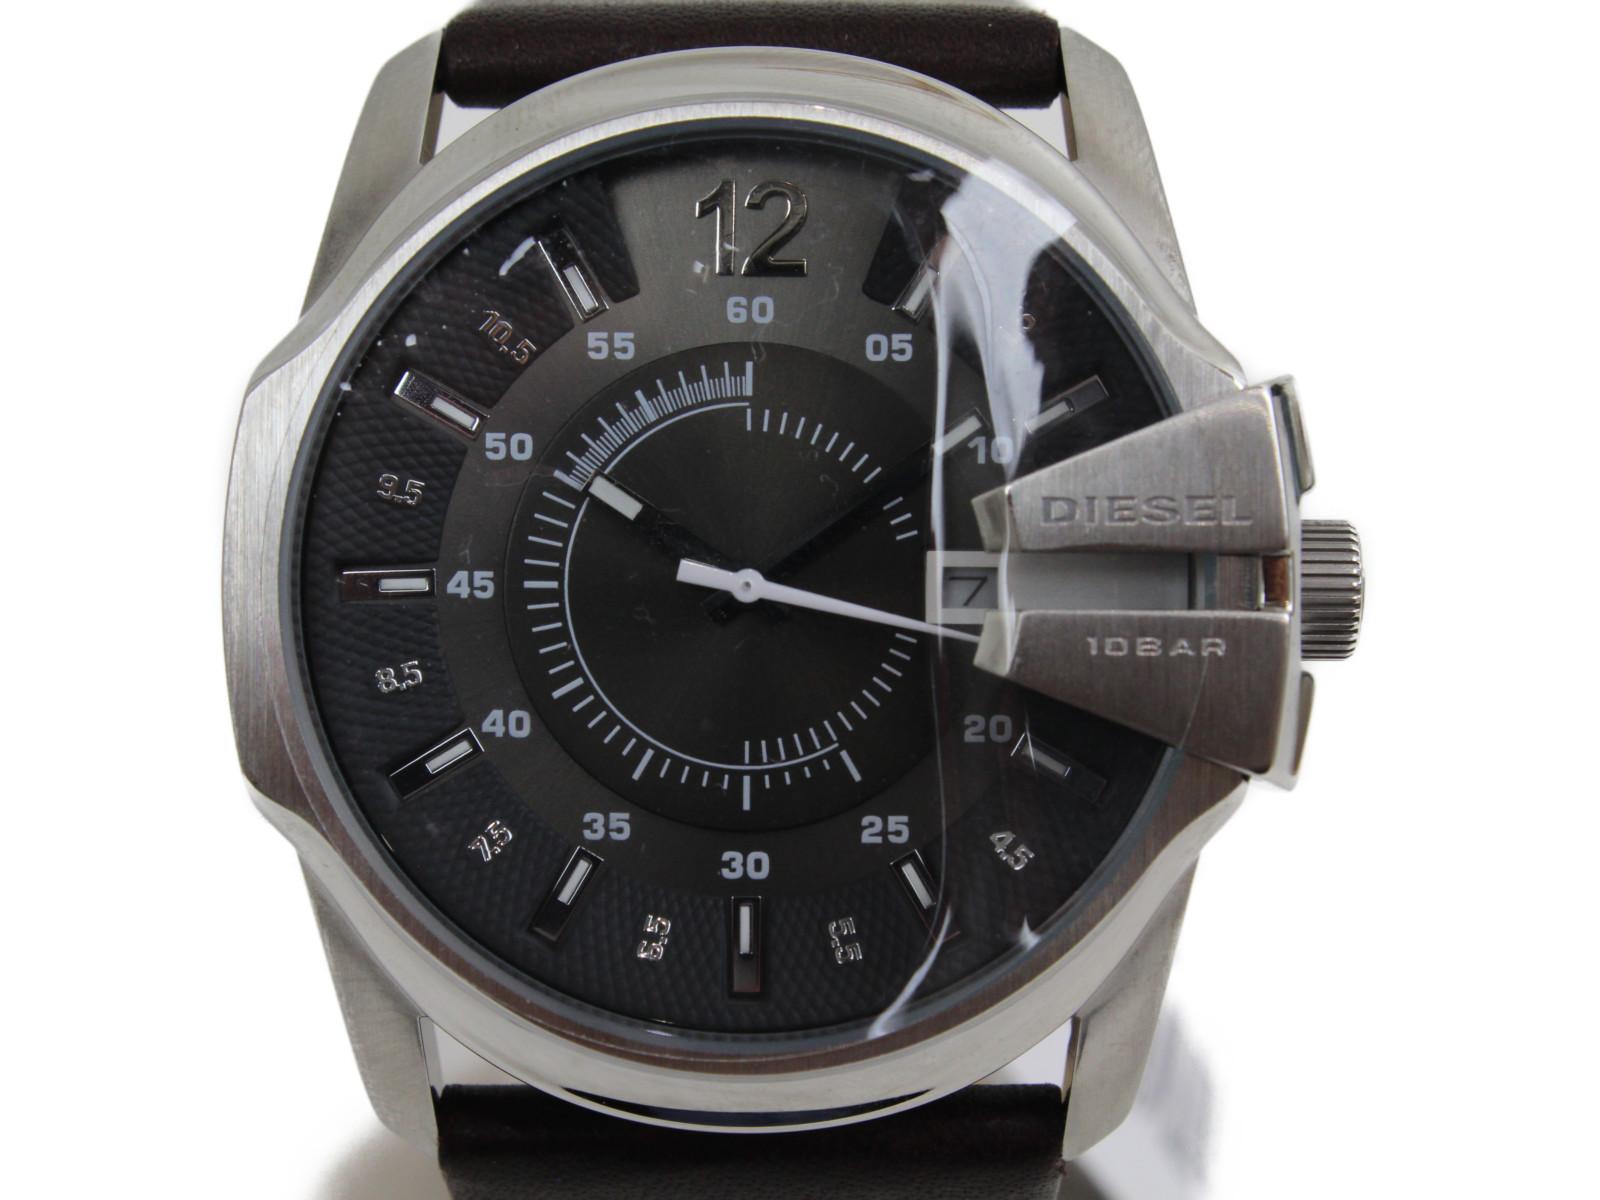 DIESEL ディーゼル マスターチーフ デイト DZ1206 クオーツ SS 革ベルト グレー ブラウン メンズ 腕時計【中古】